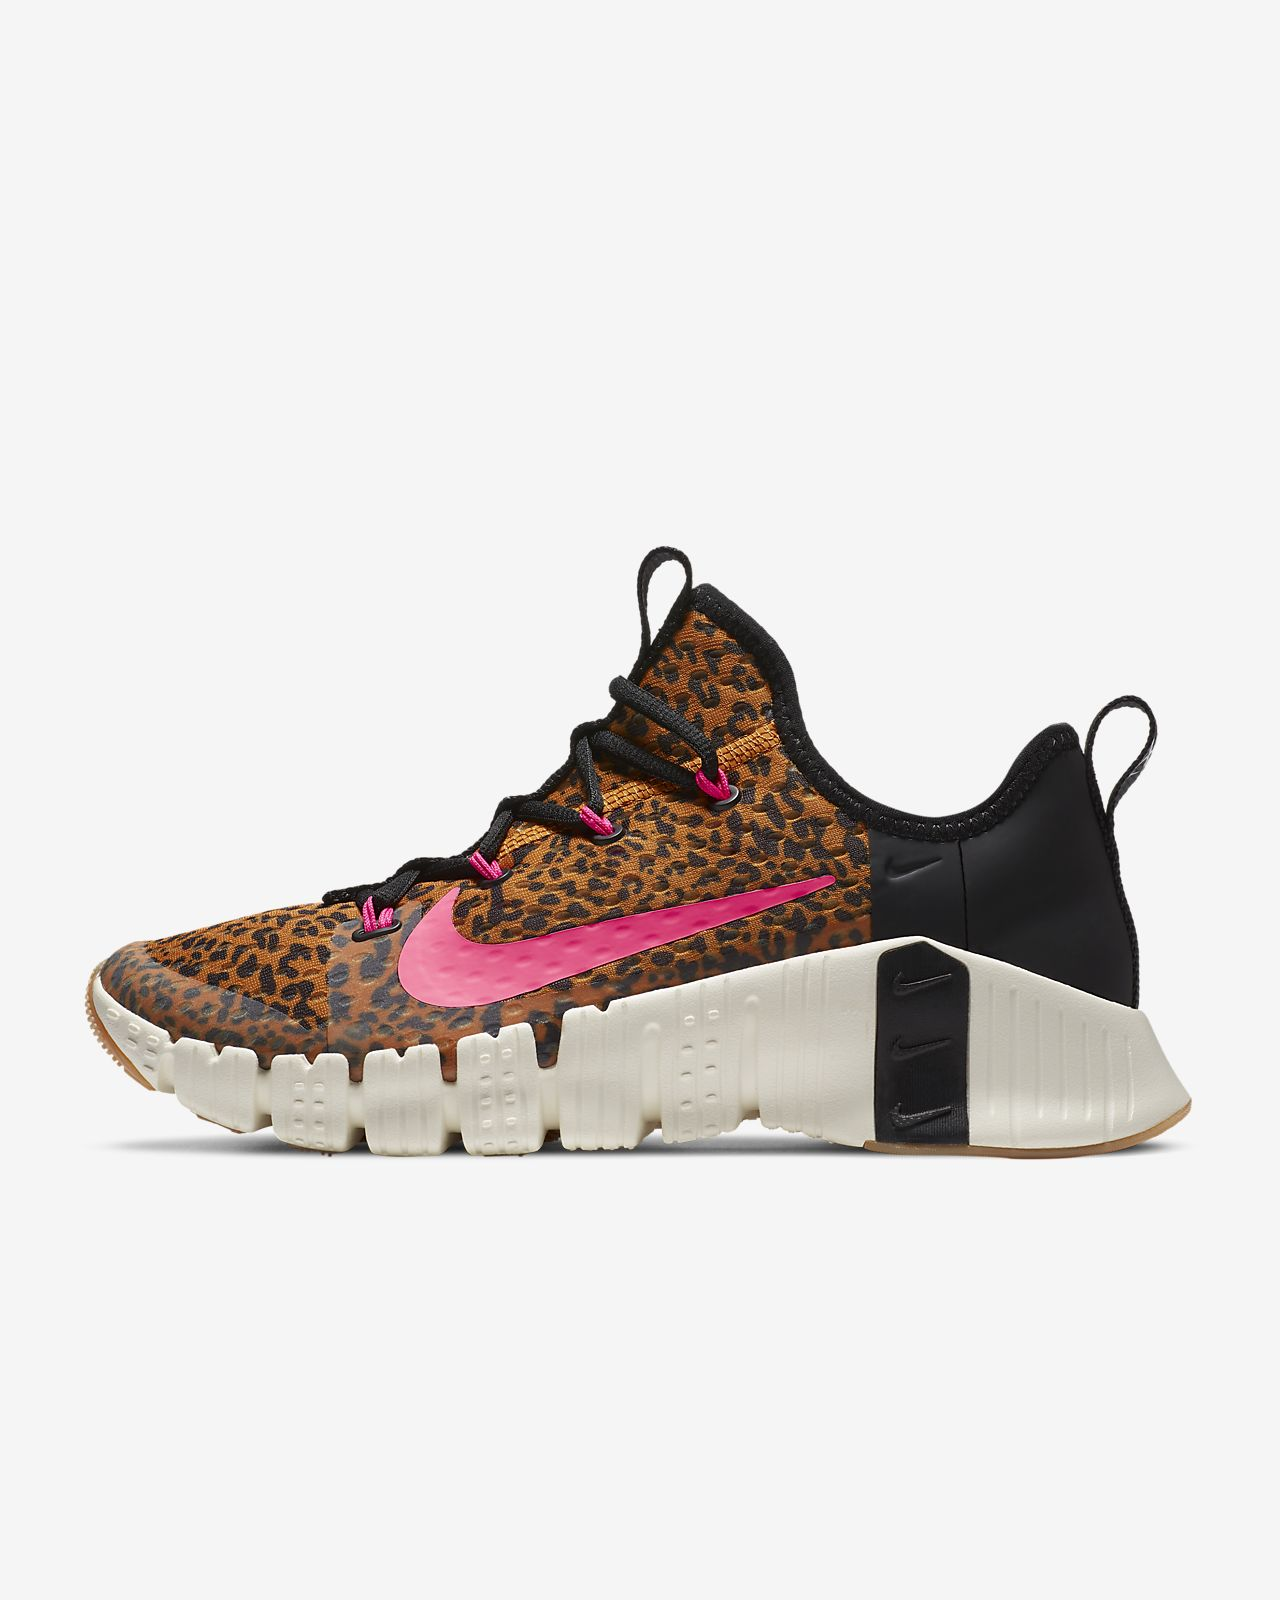 Sapatilhas de treino Nike Free Metcon 3 para mulher